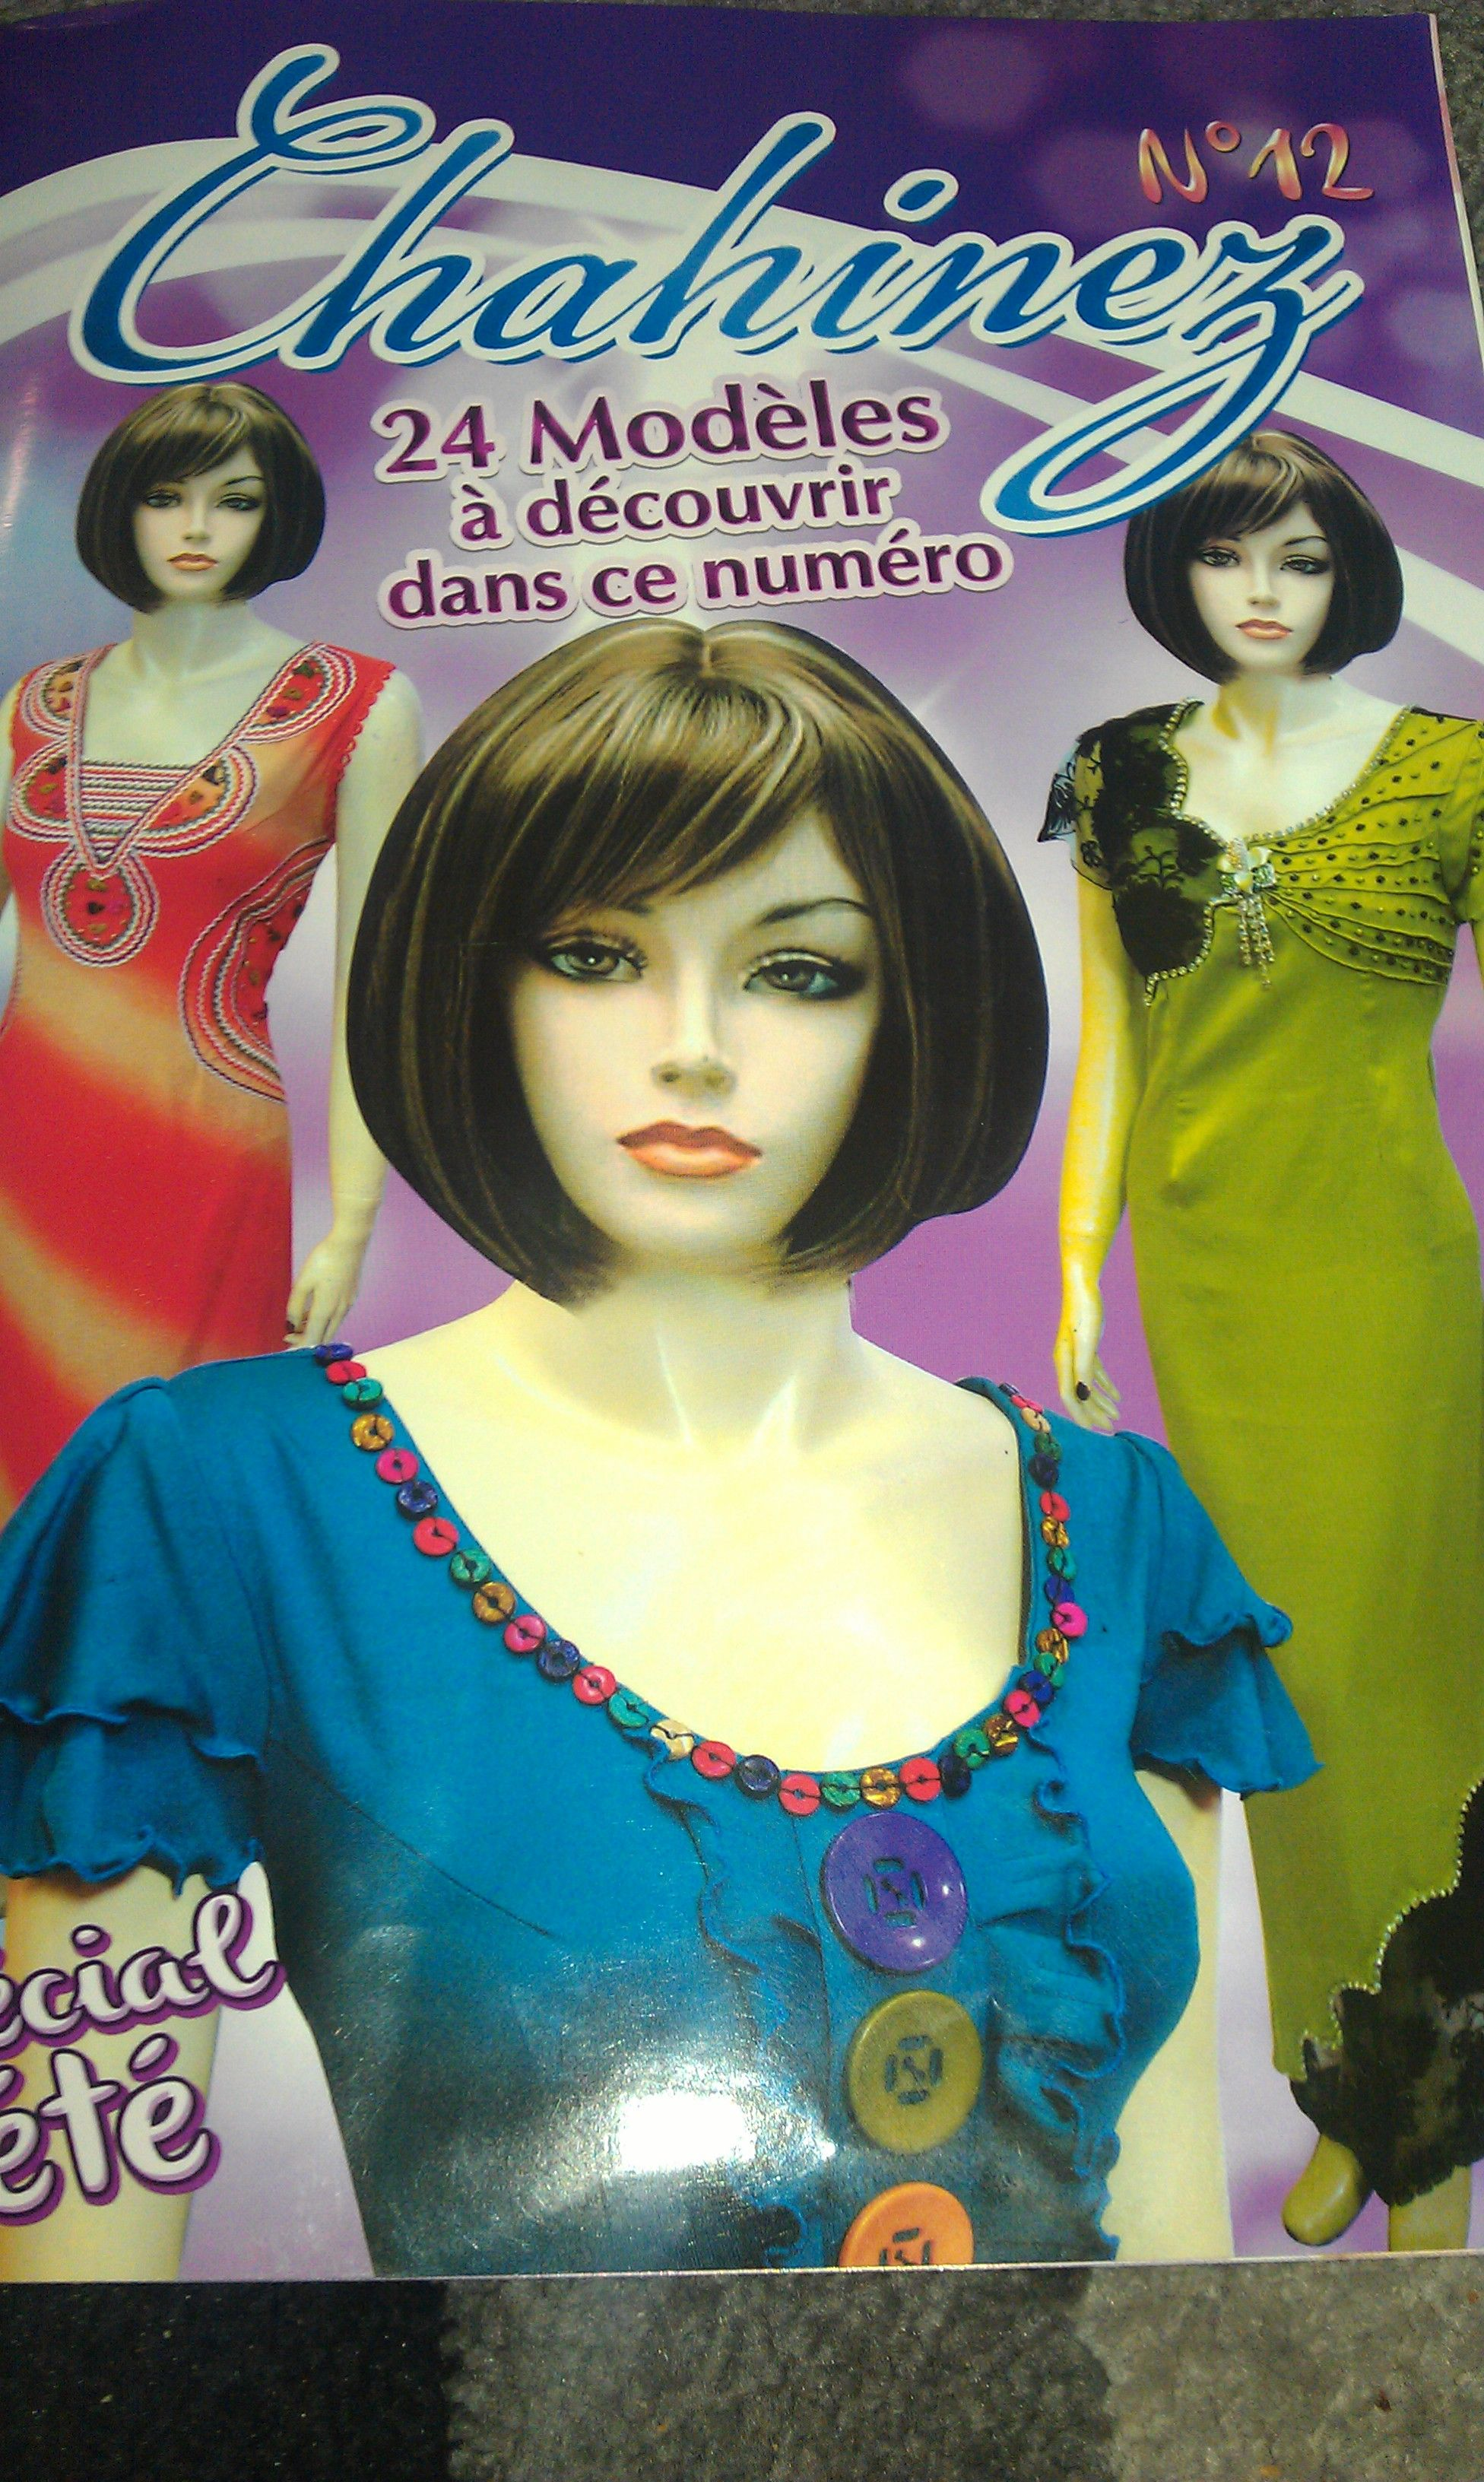 Magazine chahinez robes interieur algerien 2014 for Magazine interieur